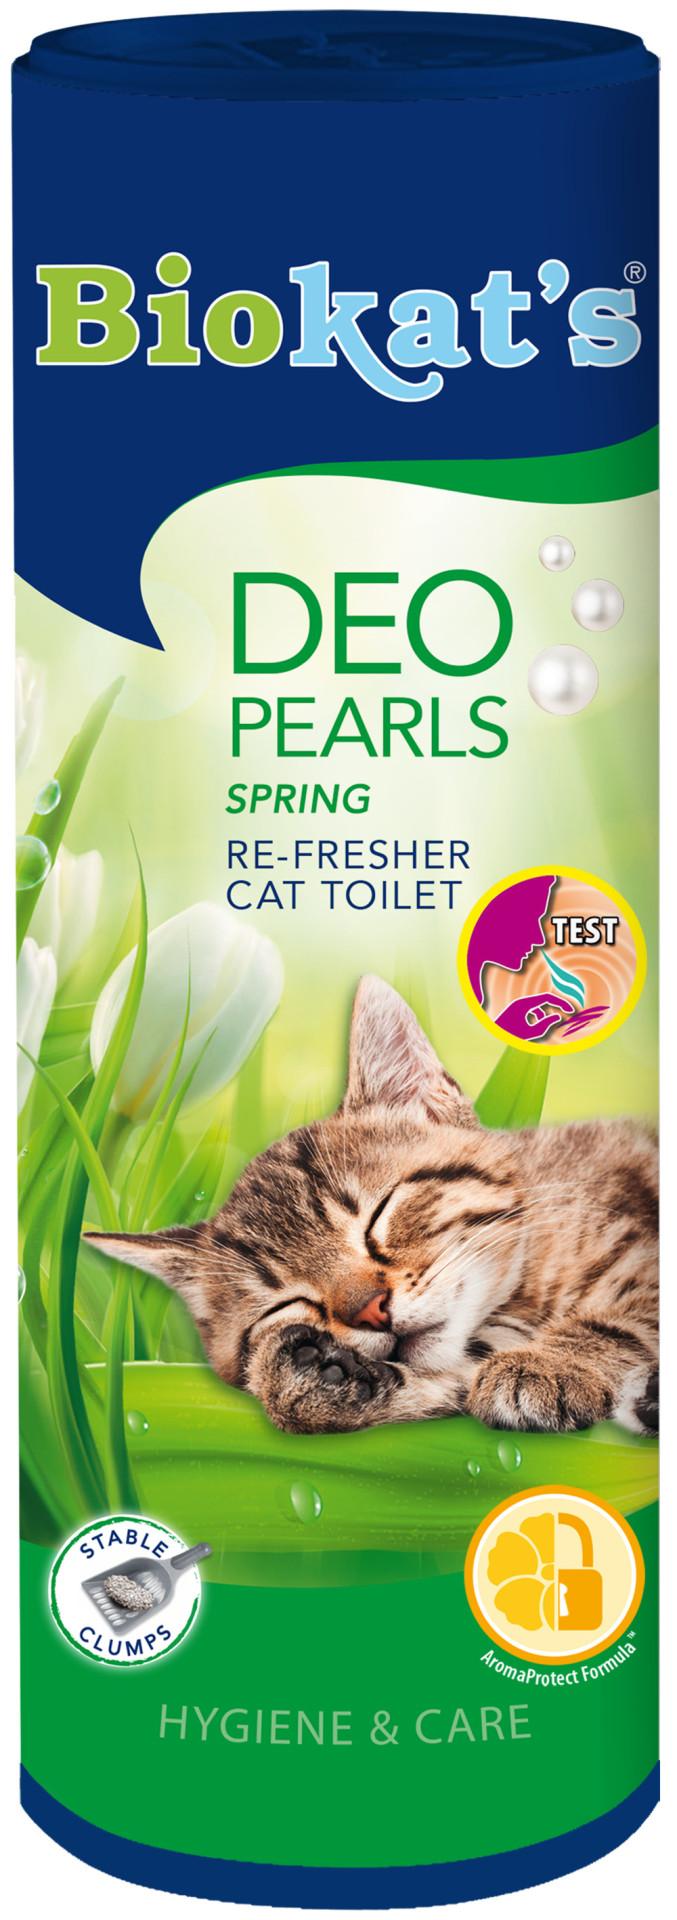 Biokat's Deo Pearls Spring 700 gr